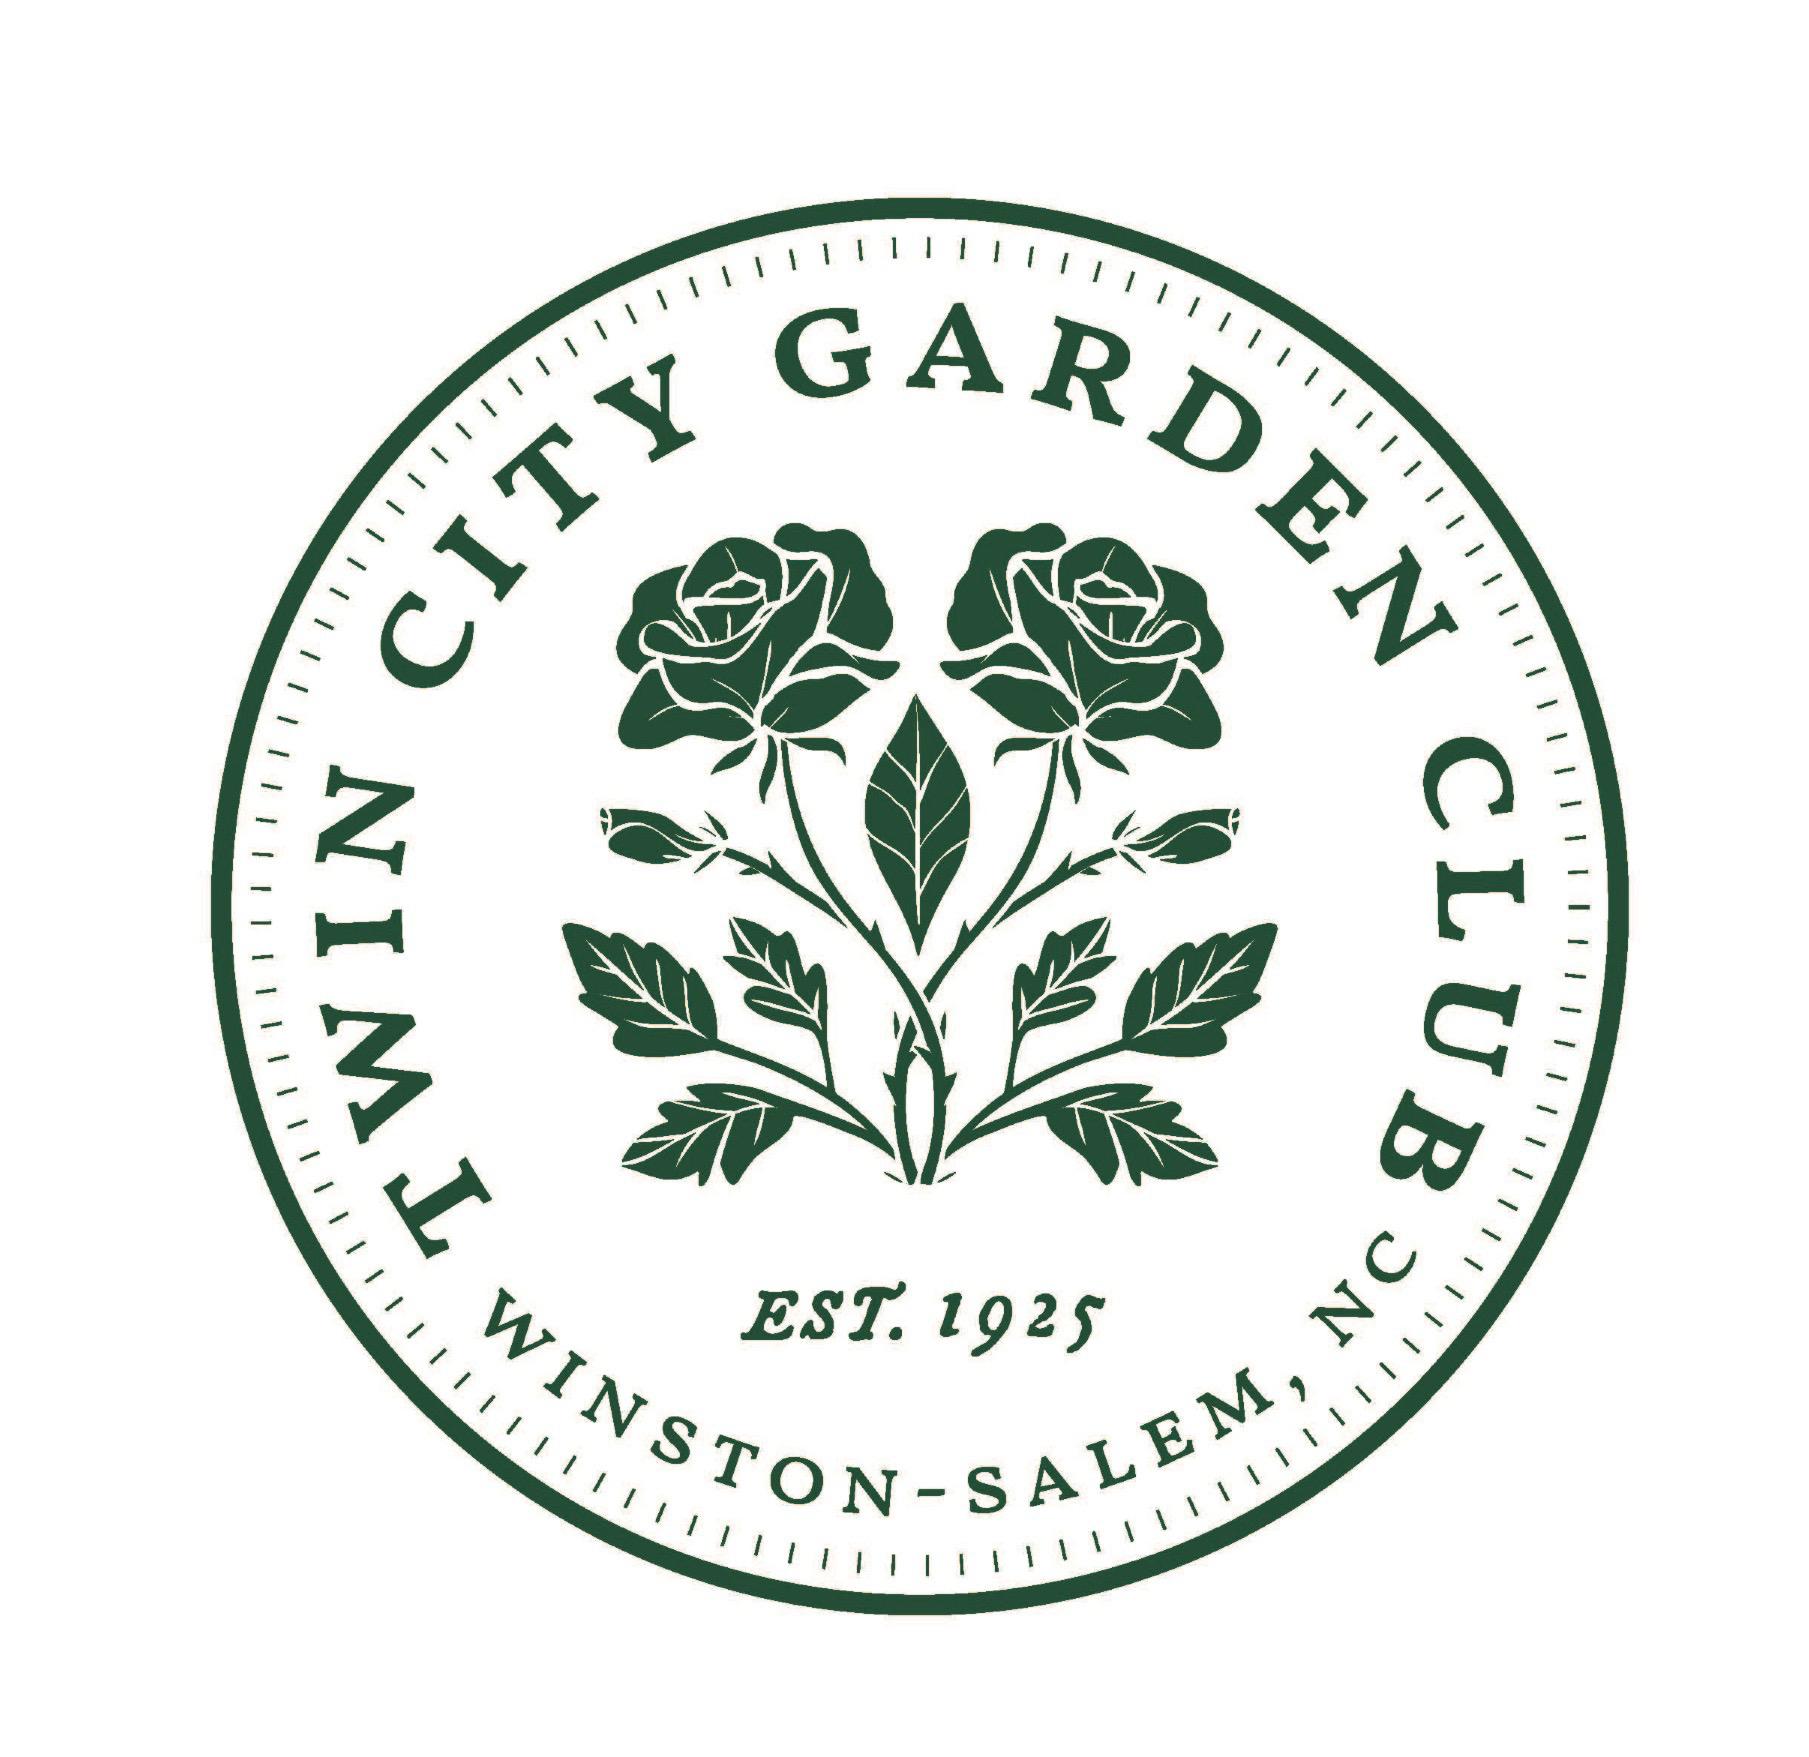 Twin City Garden Club